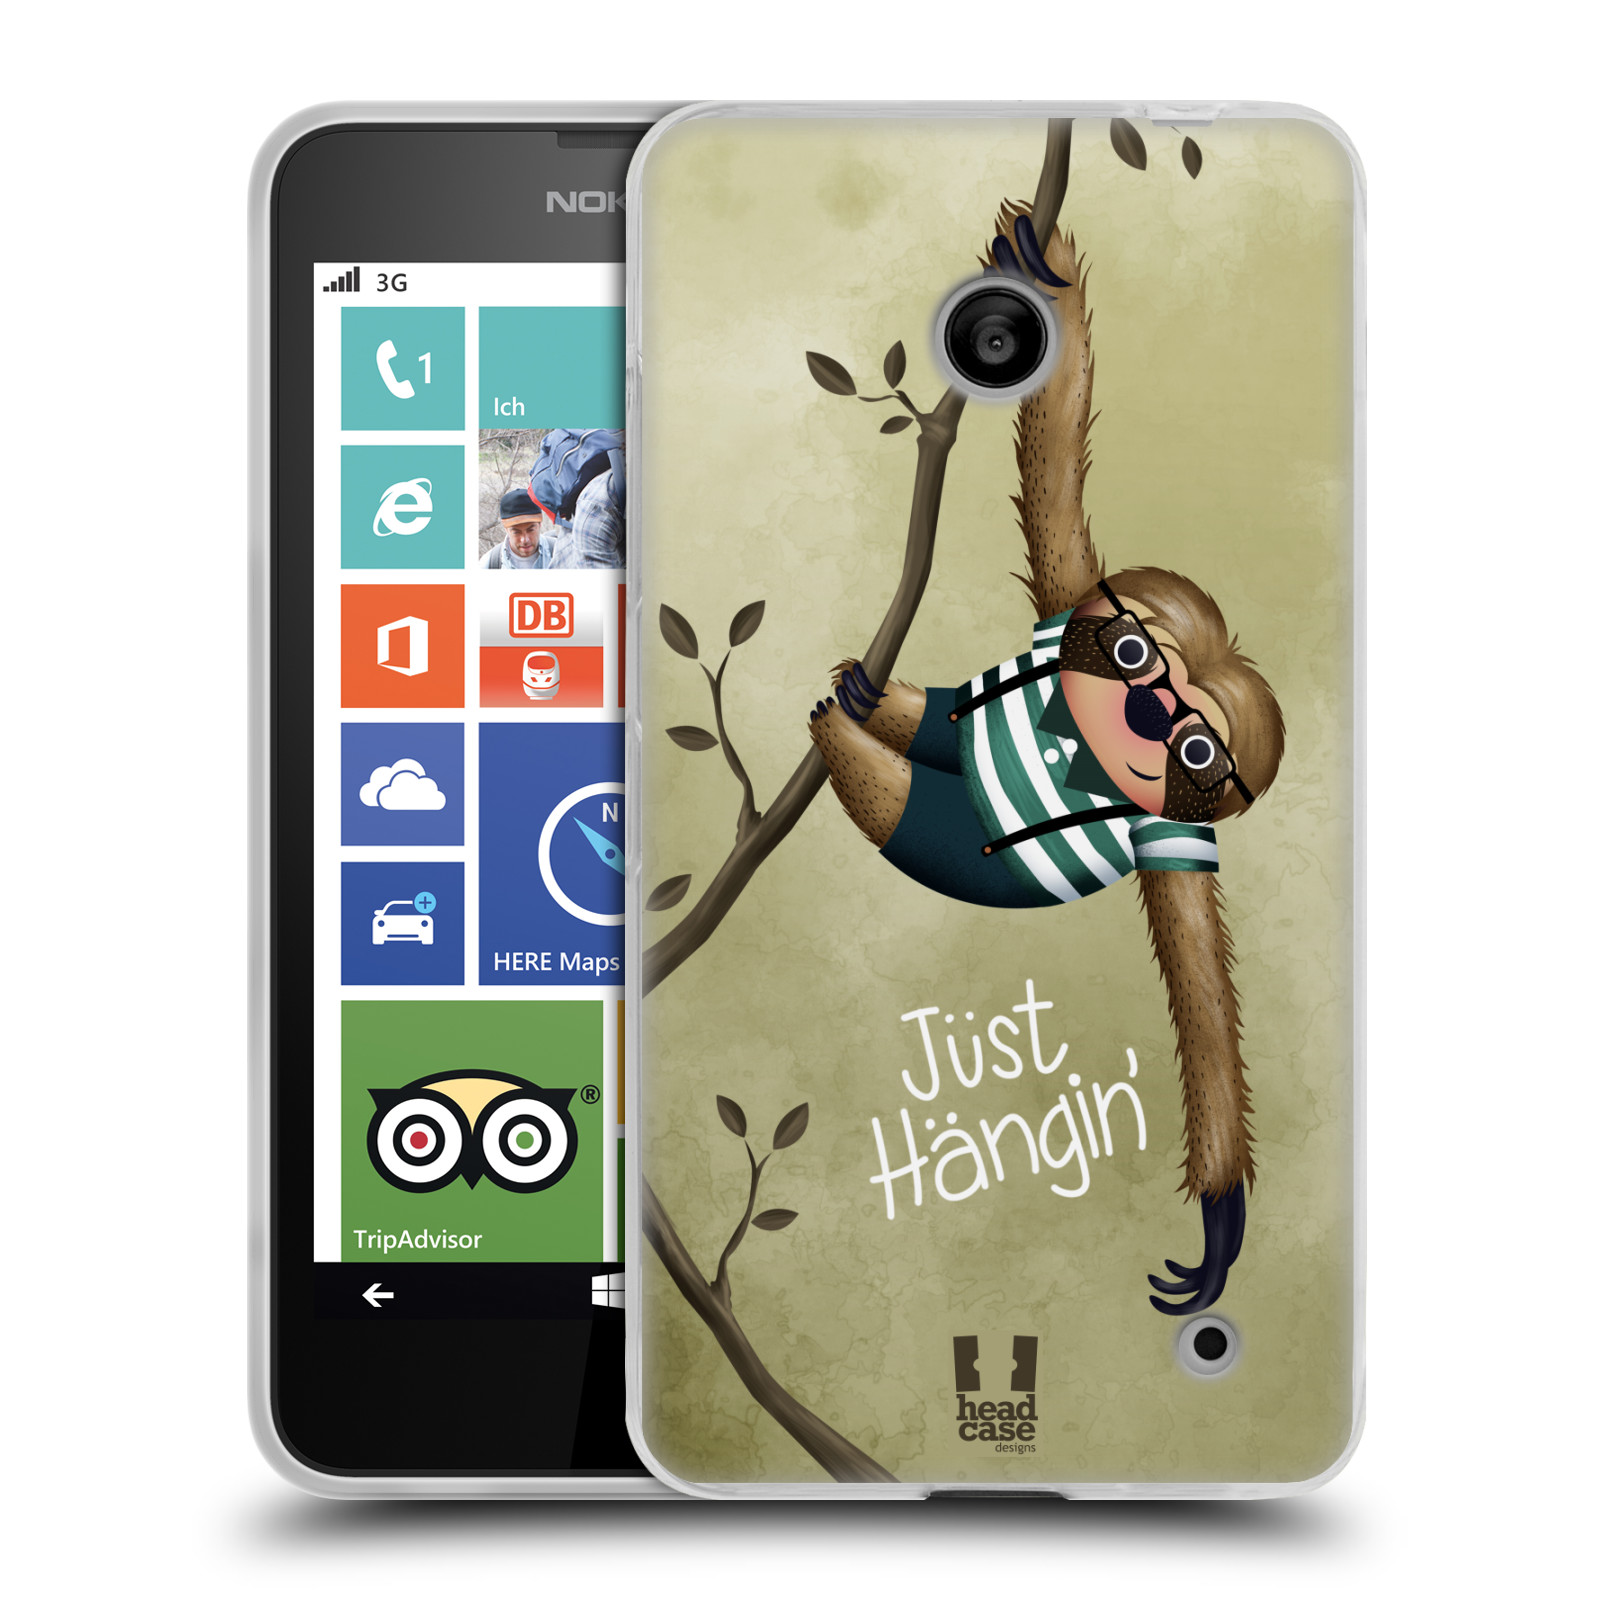 Silikonové pouzdro na mobil Nokia Lumia 635 HEAD CASE Lenochod Just Hangin (Silikonový kryt či obal na mobilní telefon Nokia Lumia 635 Dual SIM)